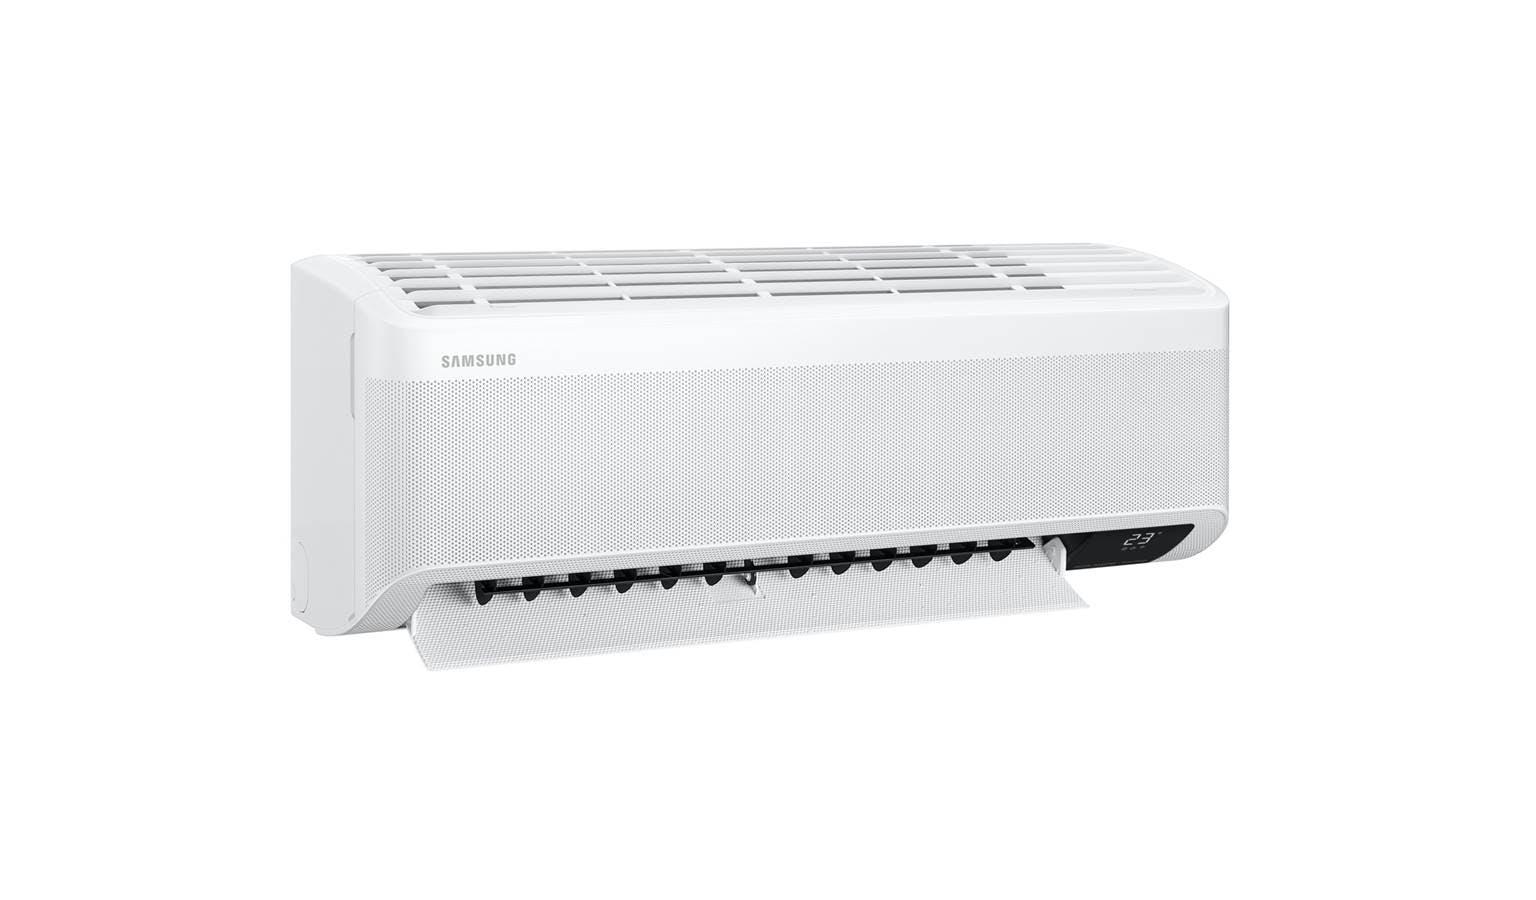 Samsung AR-10TYEAJWKNME Air Conditioner